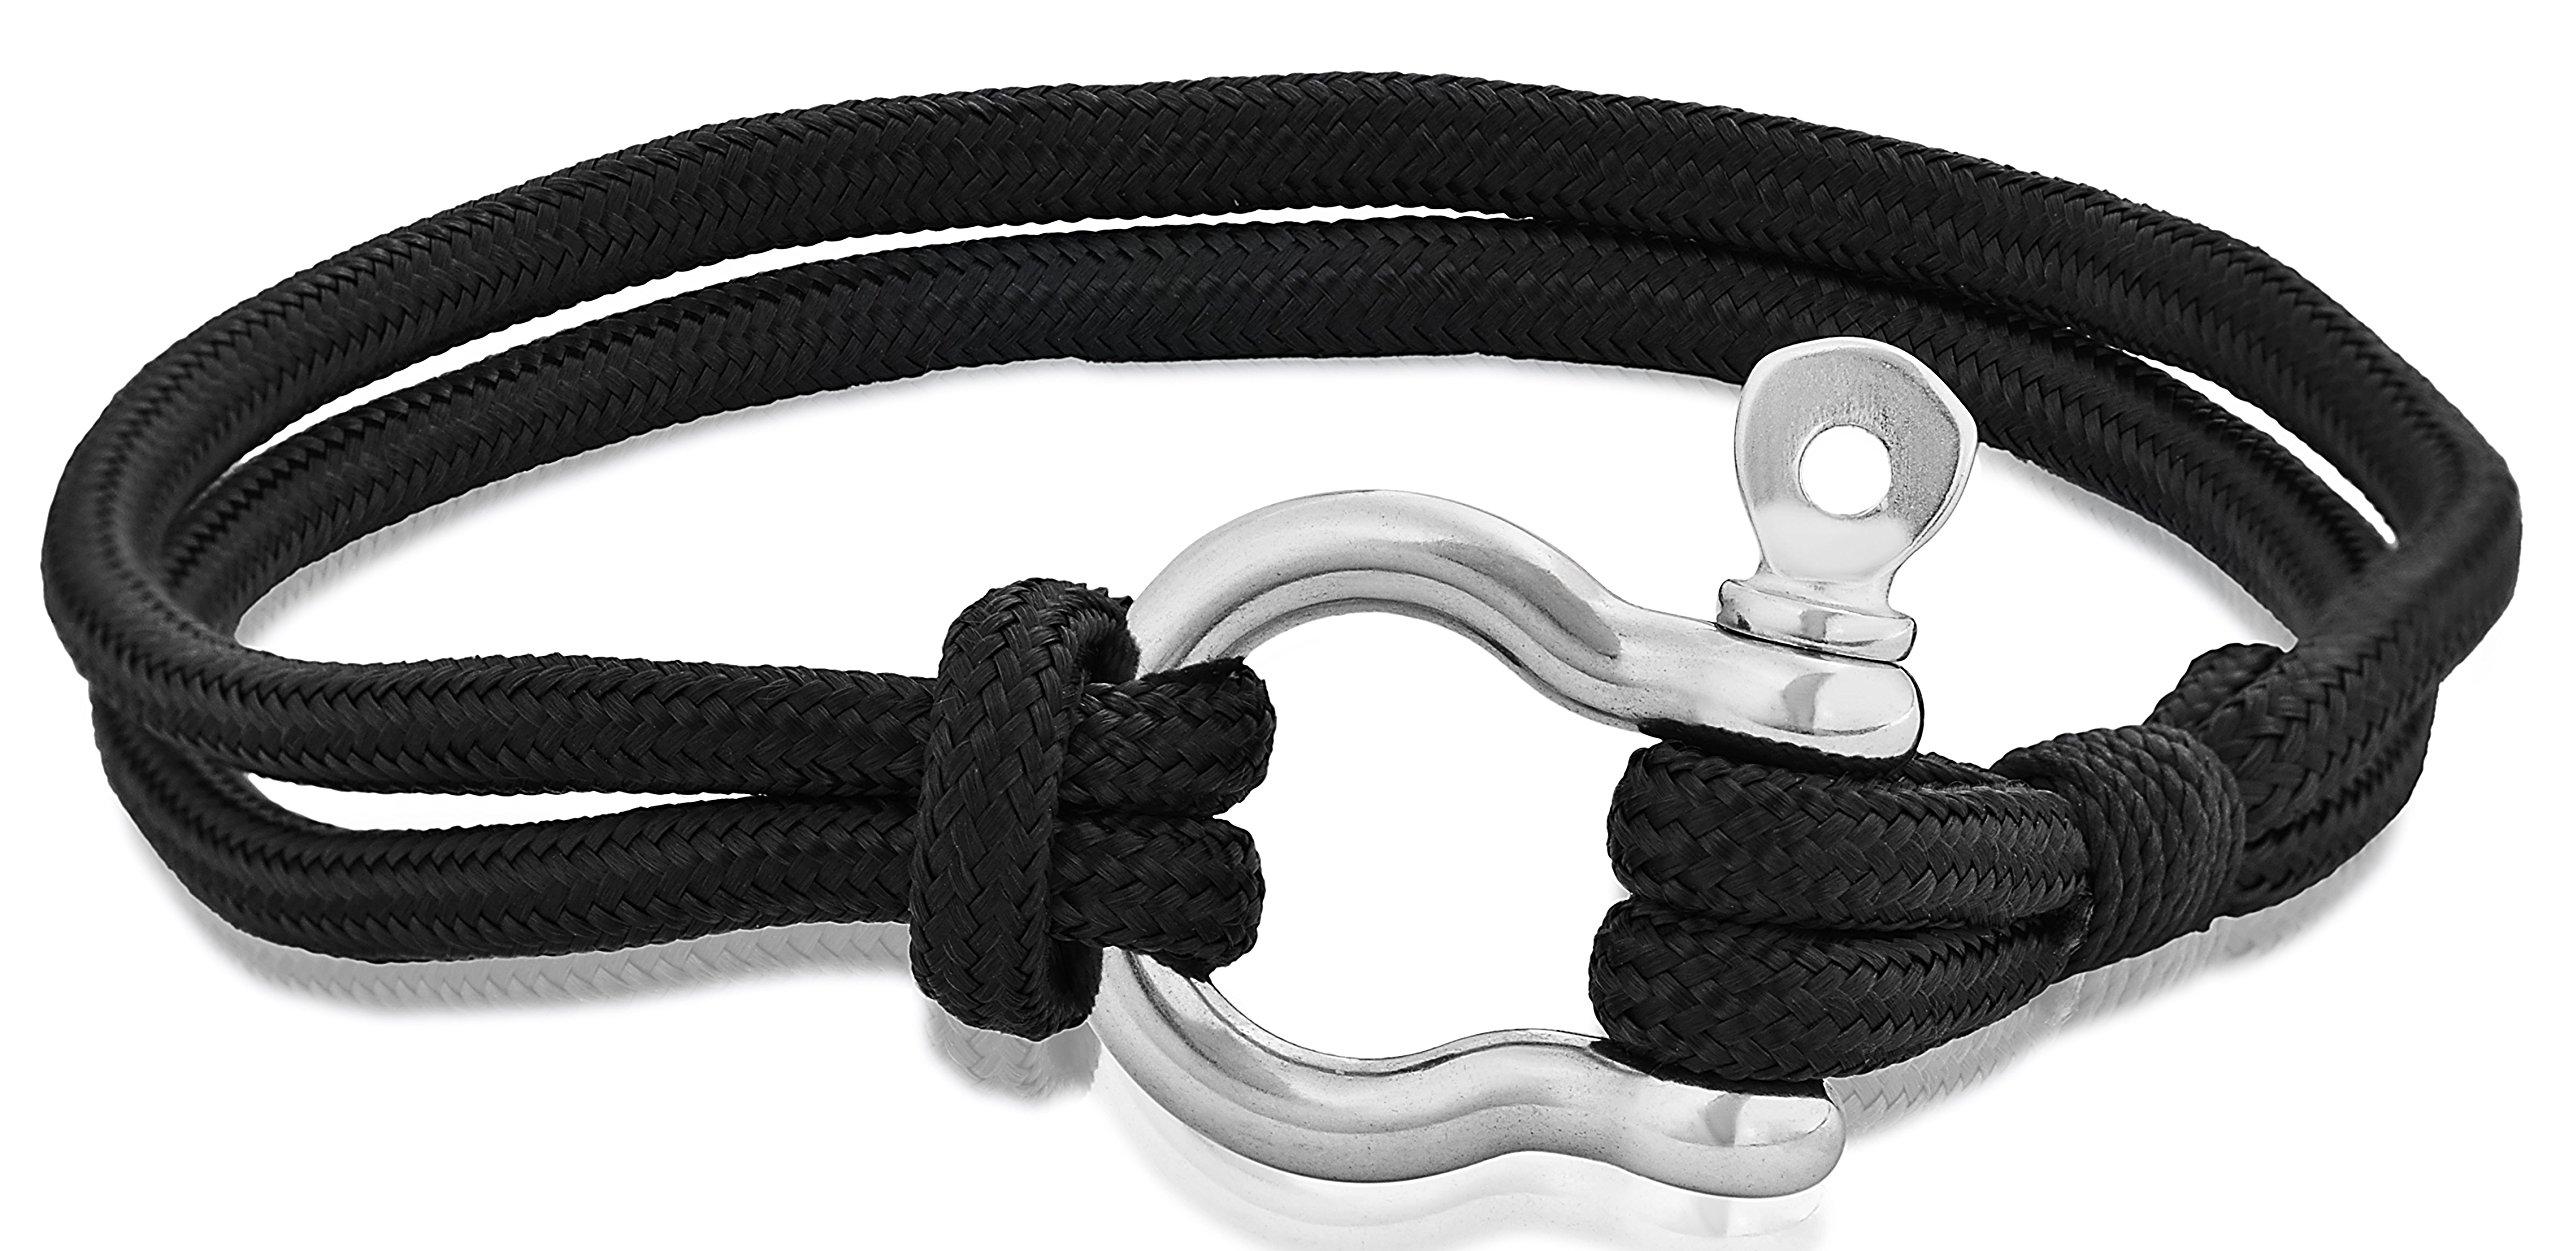 EDFORCE Stainless Steel Tactical Cord Bracelet, 8.25in